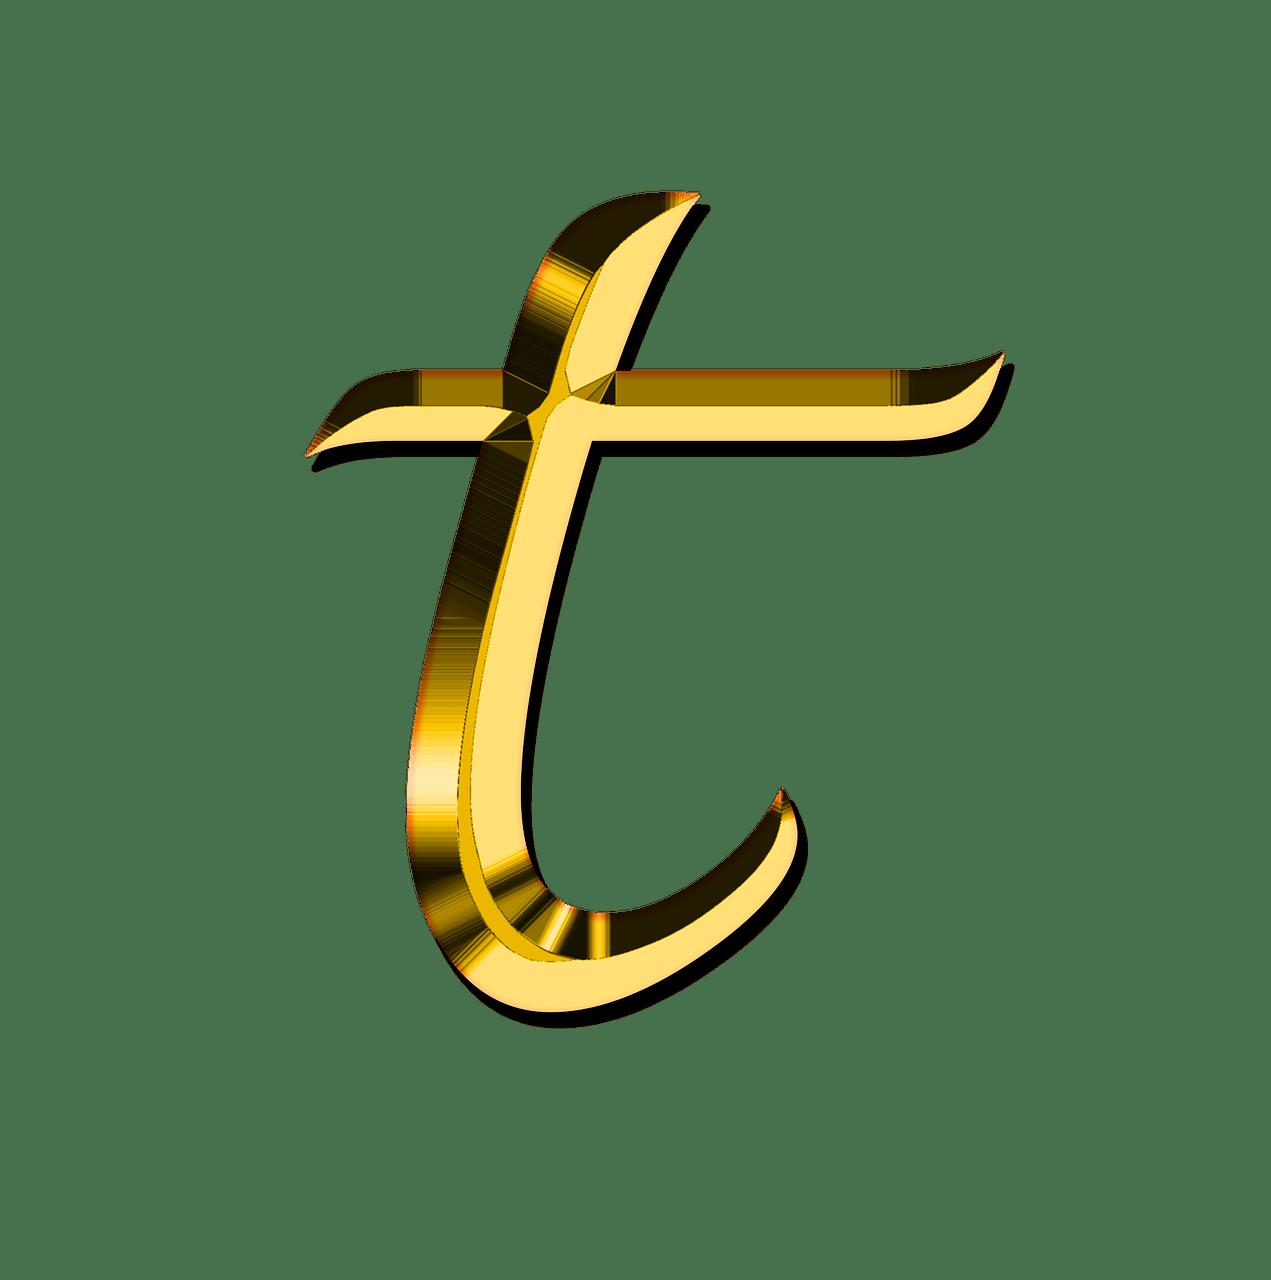 T Letter PNG Transparent Images.